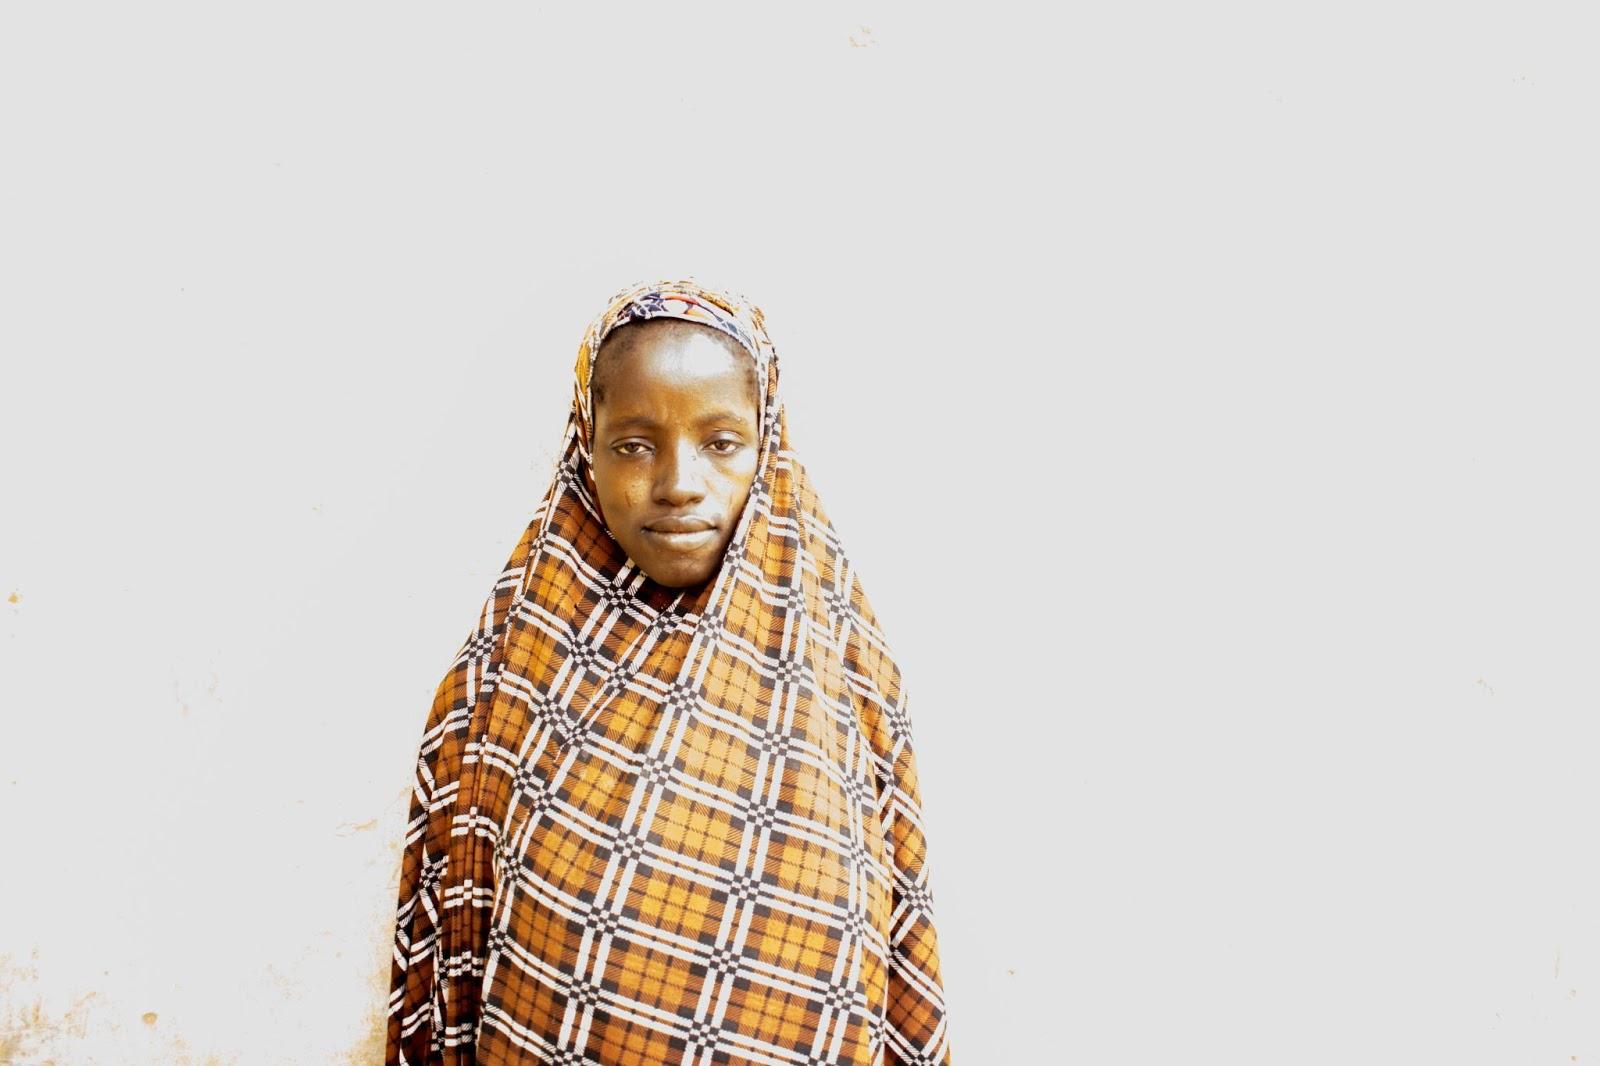 Aisha, 25. Photo Credit: Qosim Suleiman